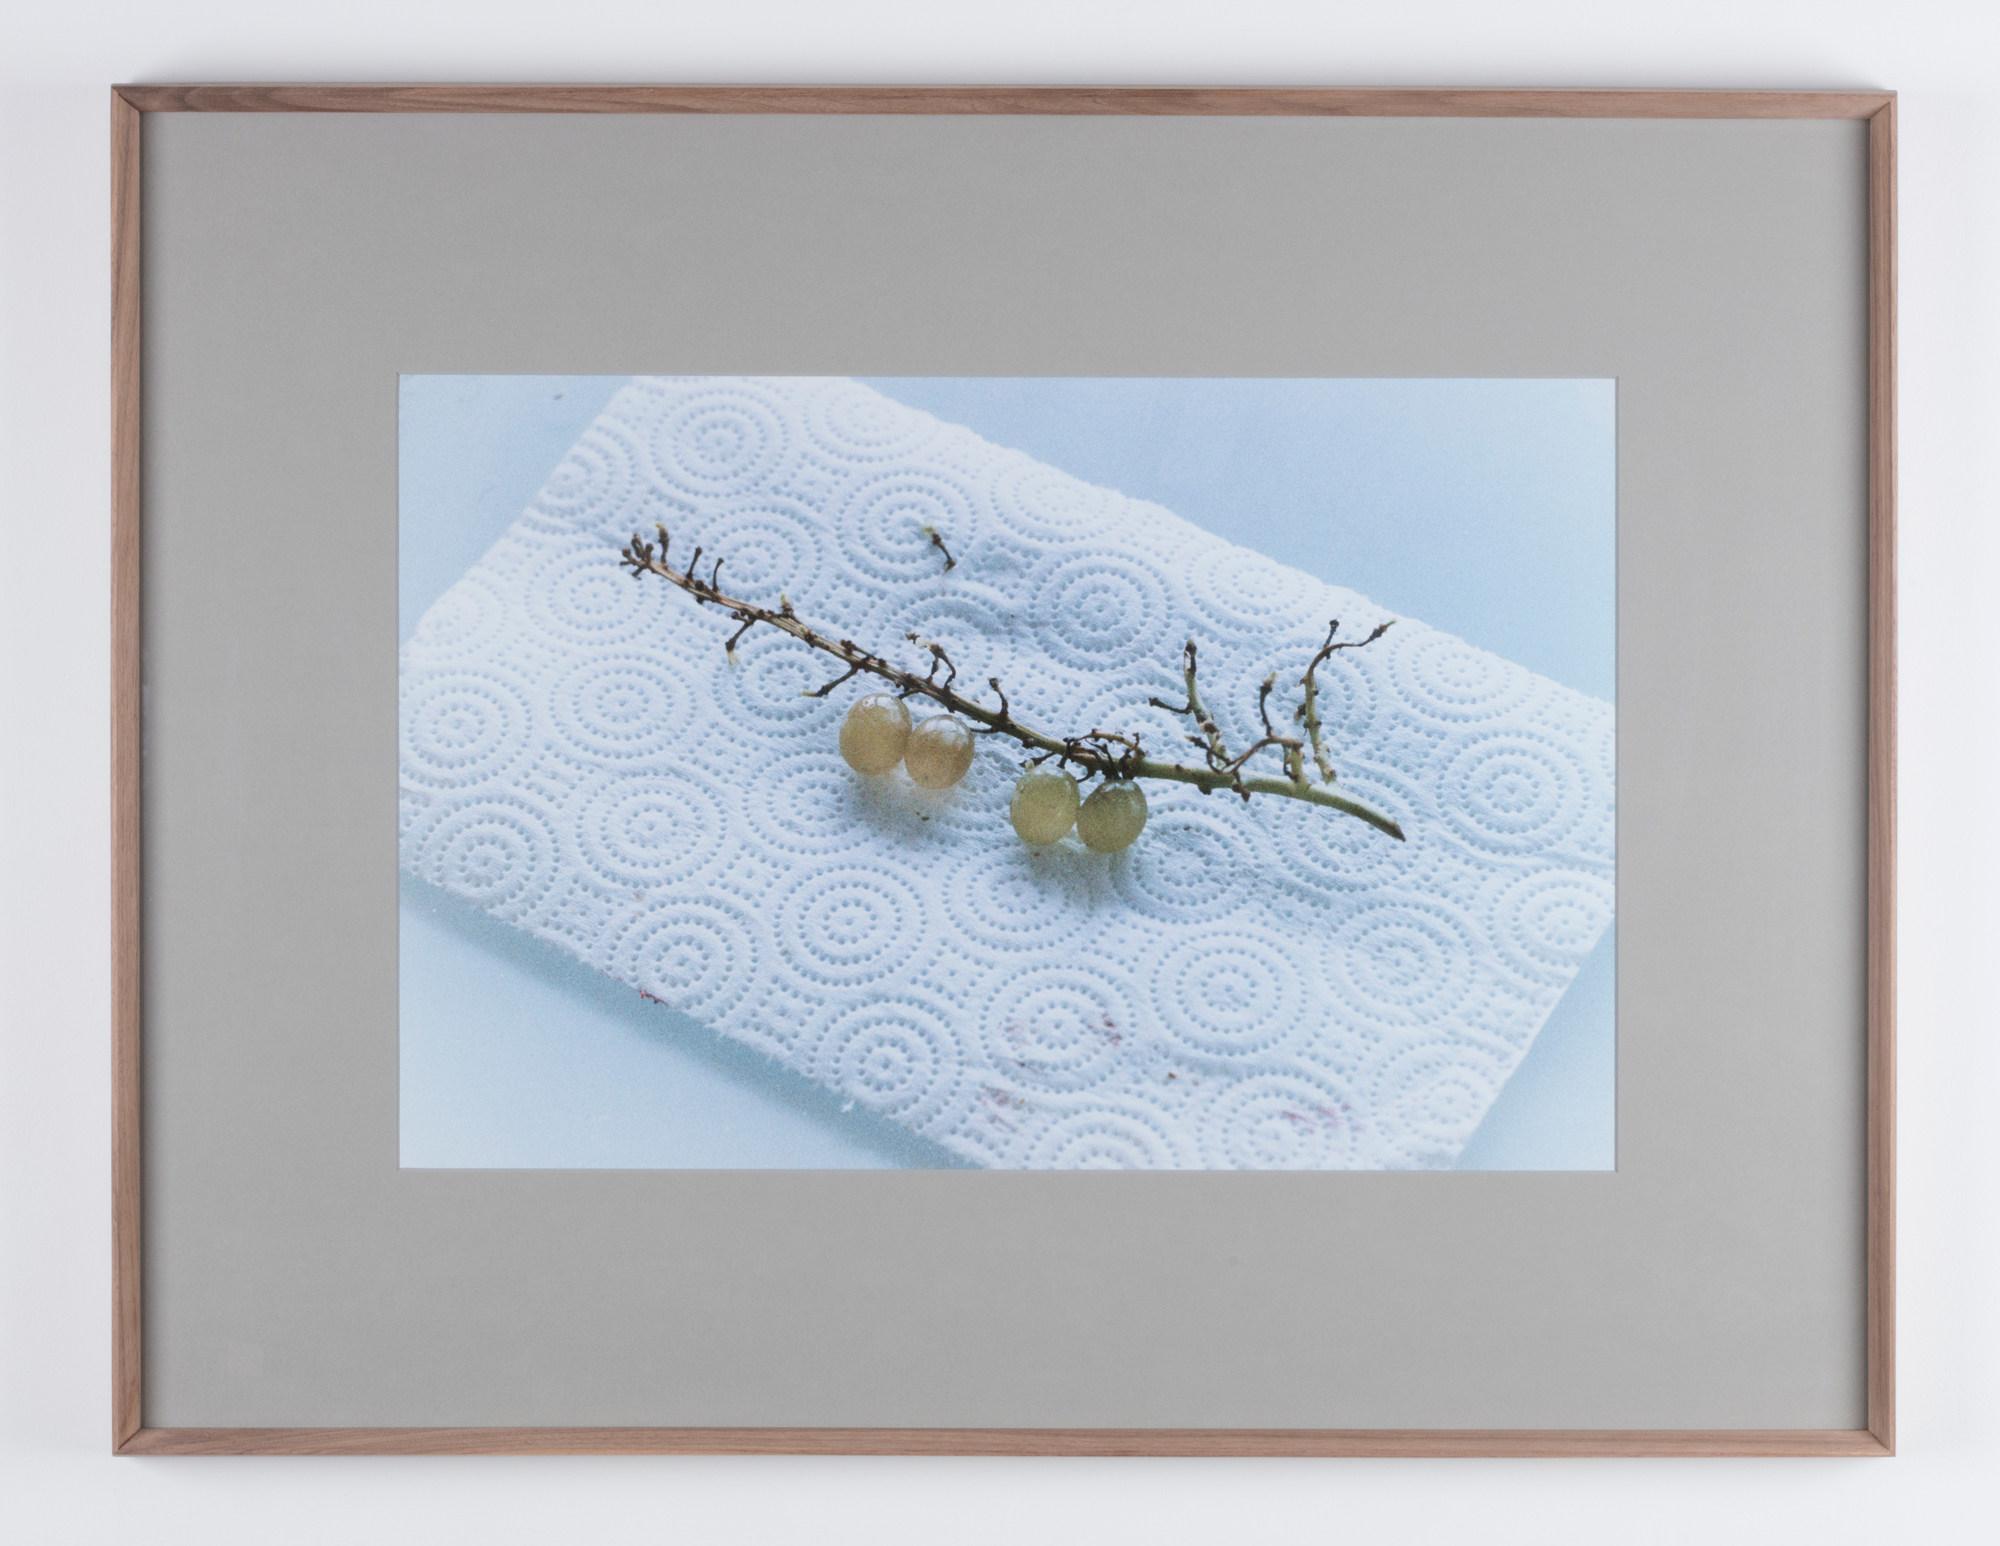 2.Oto_Gillen_Tomorrow_Grapes-2000